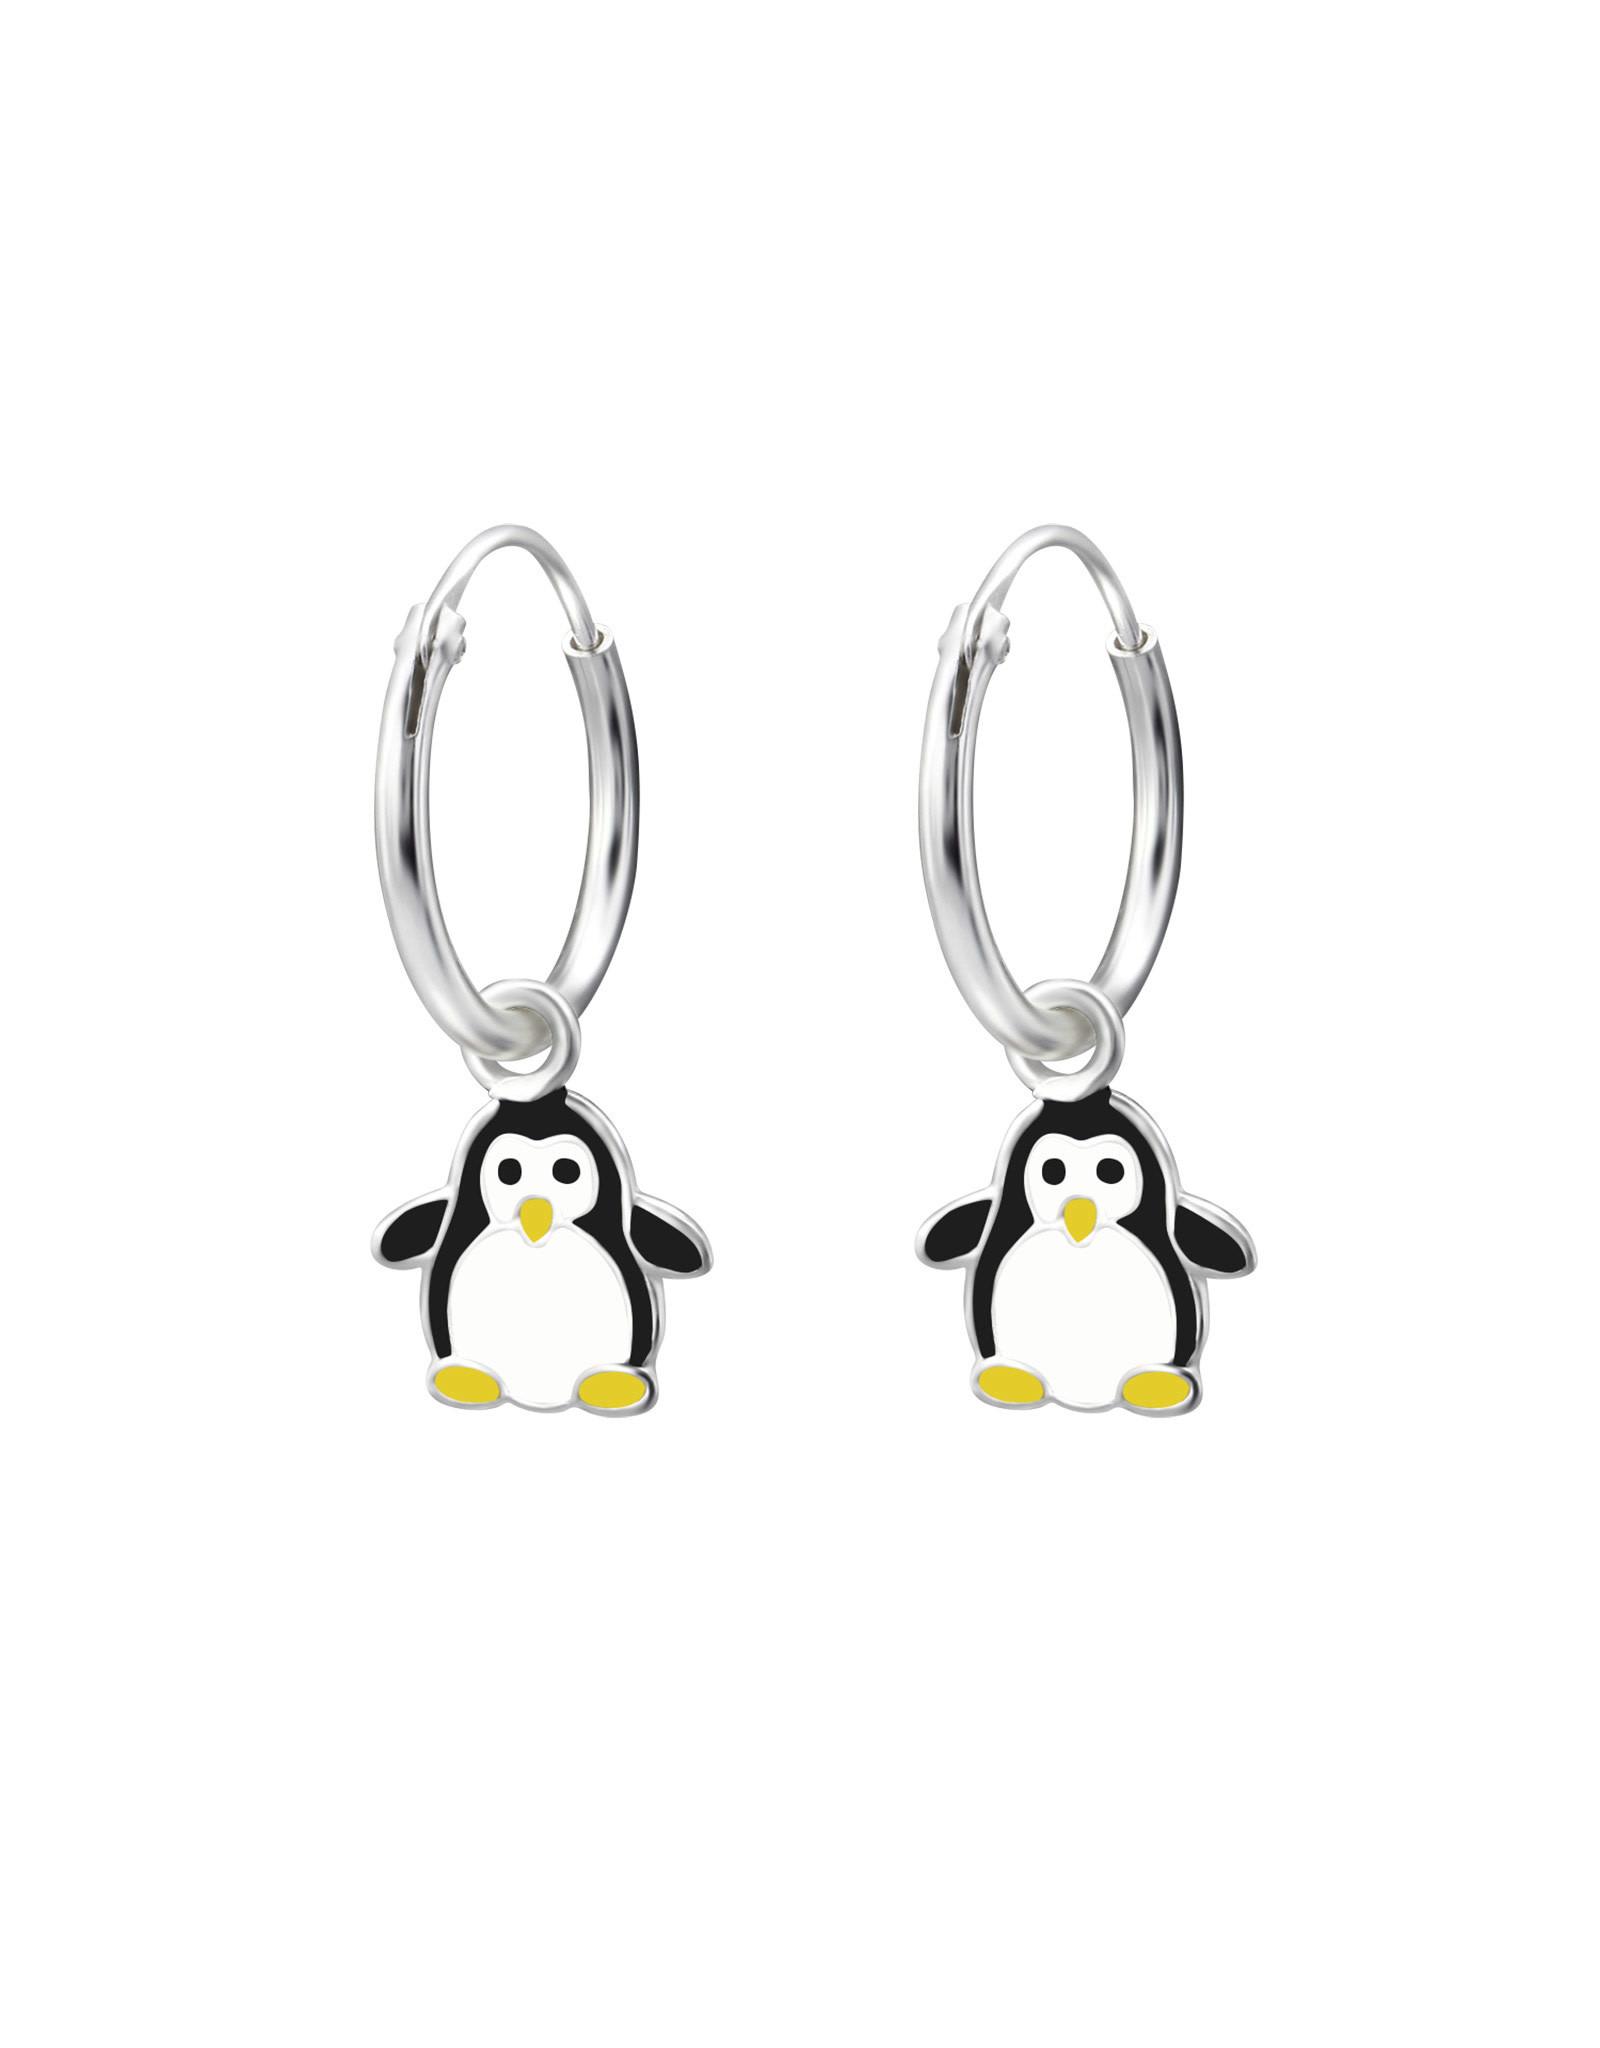 Ringetjes zilver pinguïn